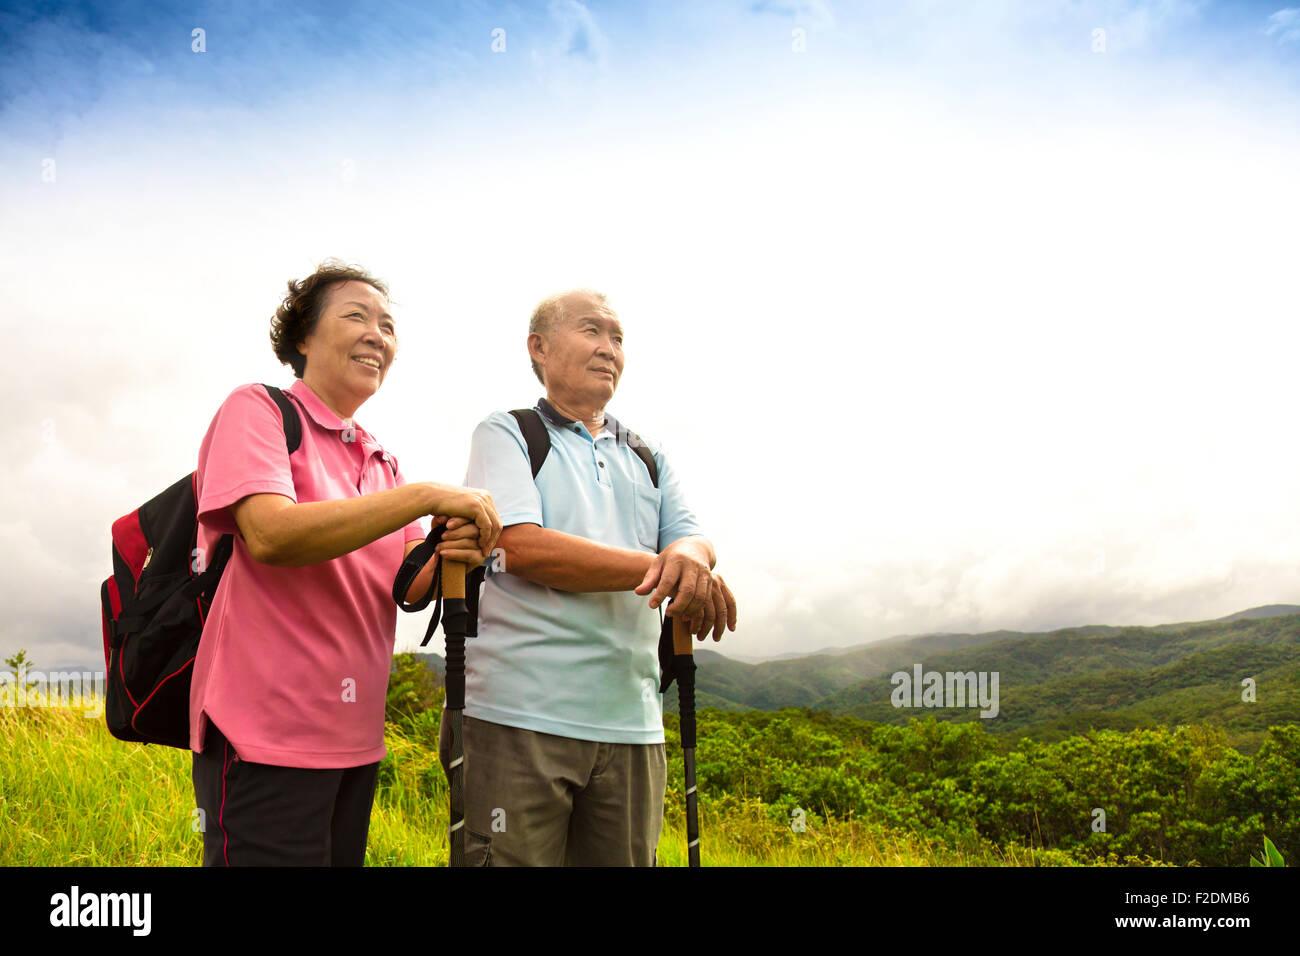 happy senior couple hiking on the mountain - Stock Image